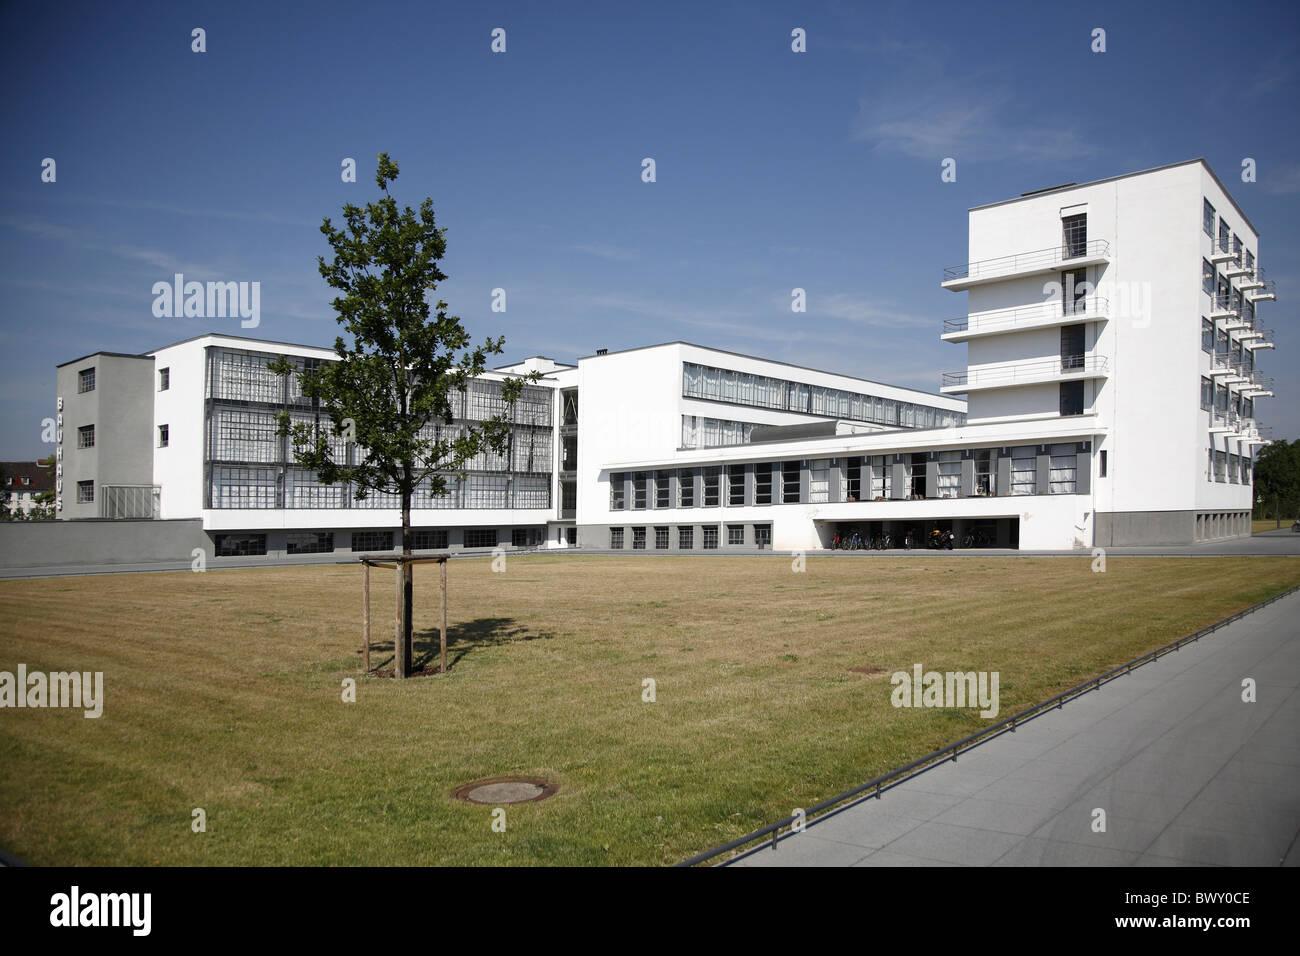 Dessau Bauhaus - Stock Image